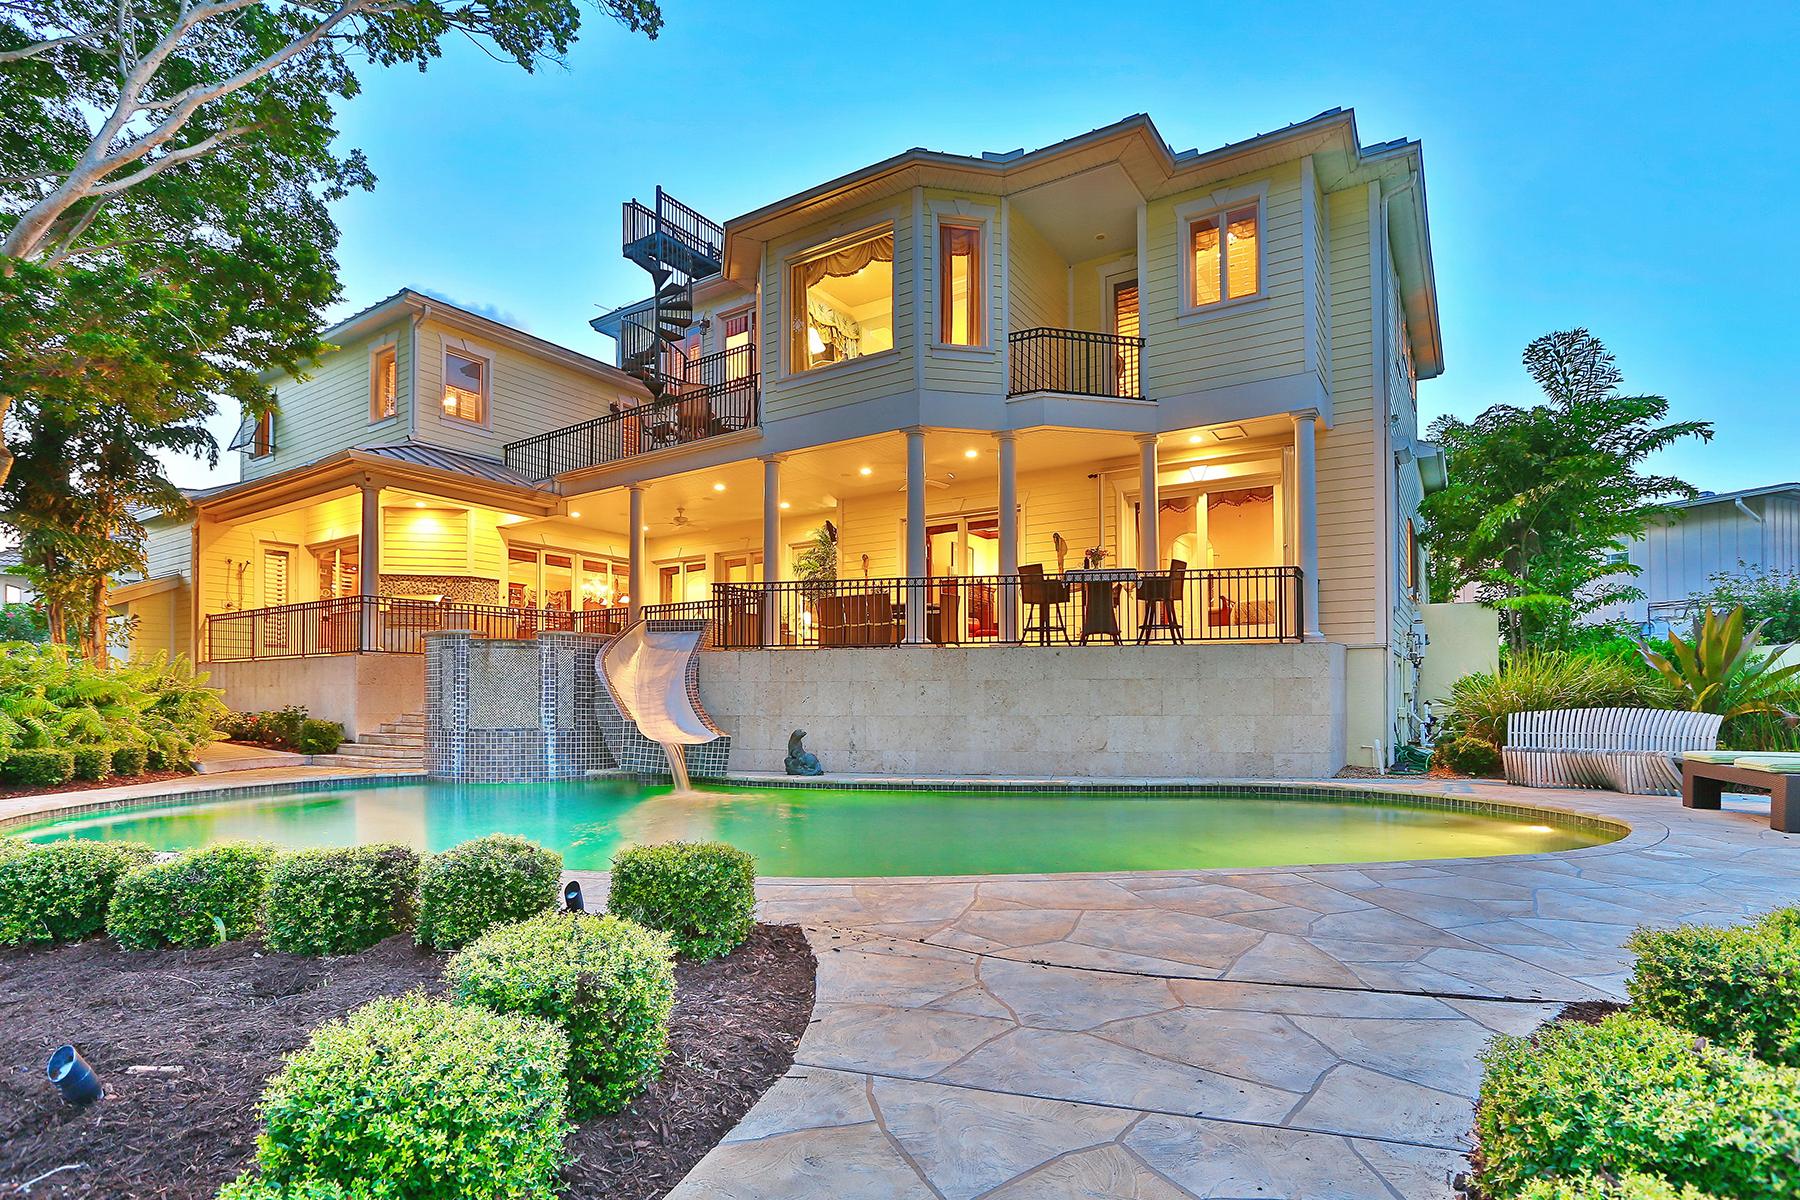 独户住宅 为 销售 在 SAN REMO ESTATES 3657 San Remo Terr Sarasota, 佛罗里达州 34239 美国